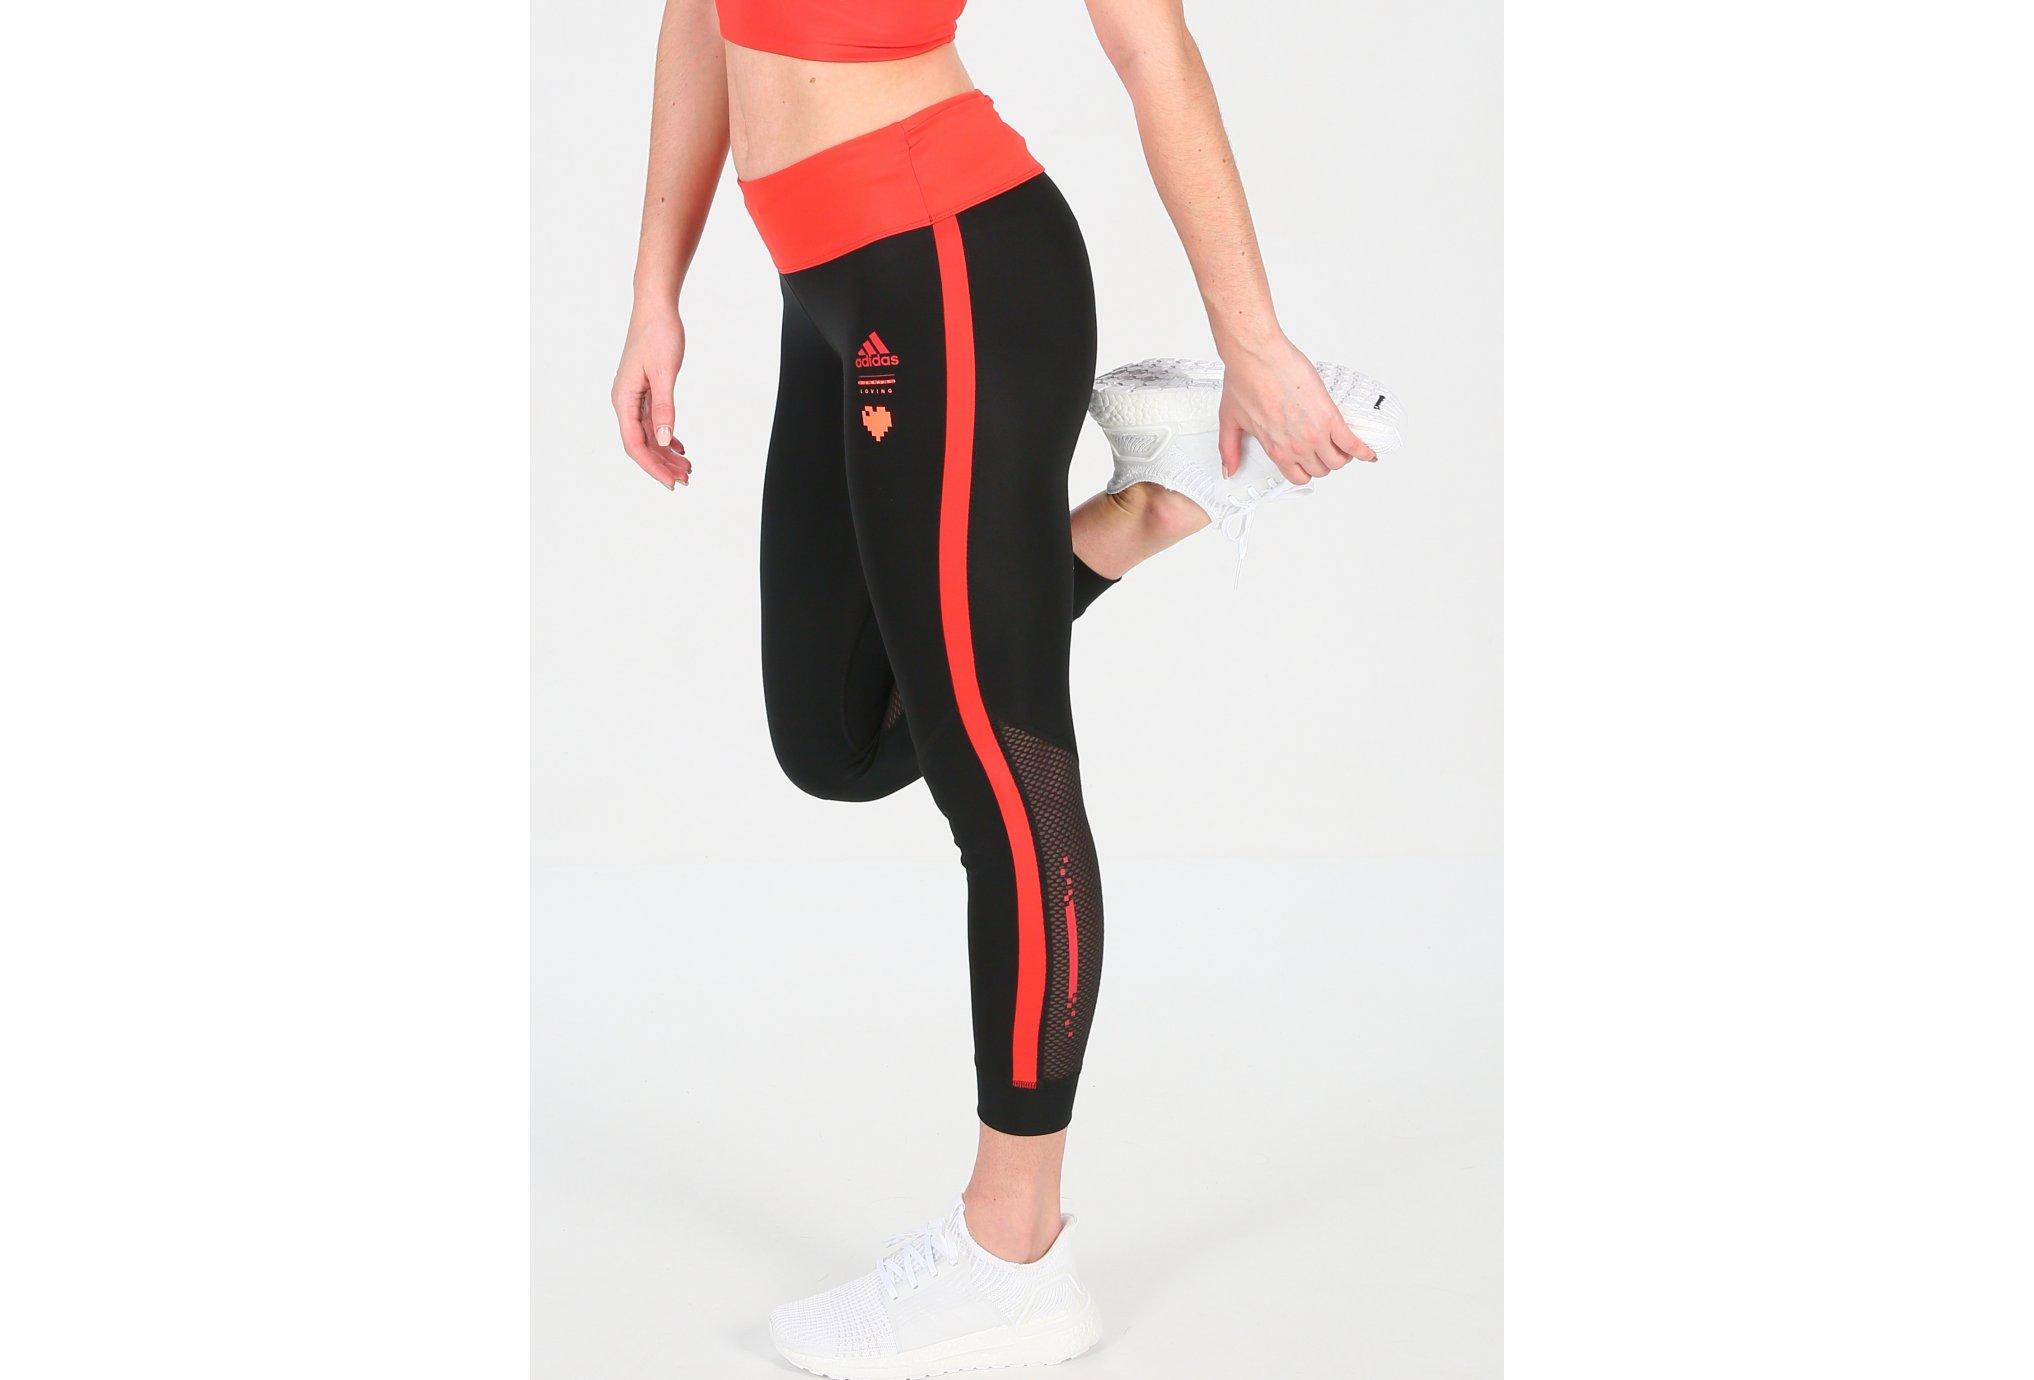 adidas Own The Run Valentine 7/8 W vêtement running femme